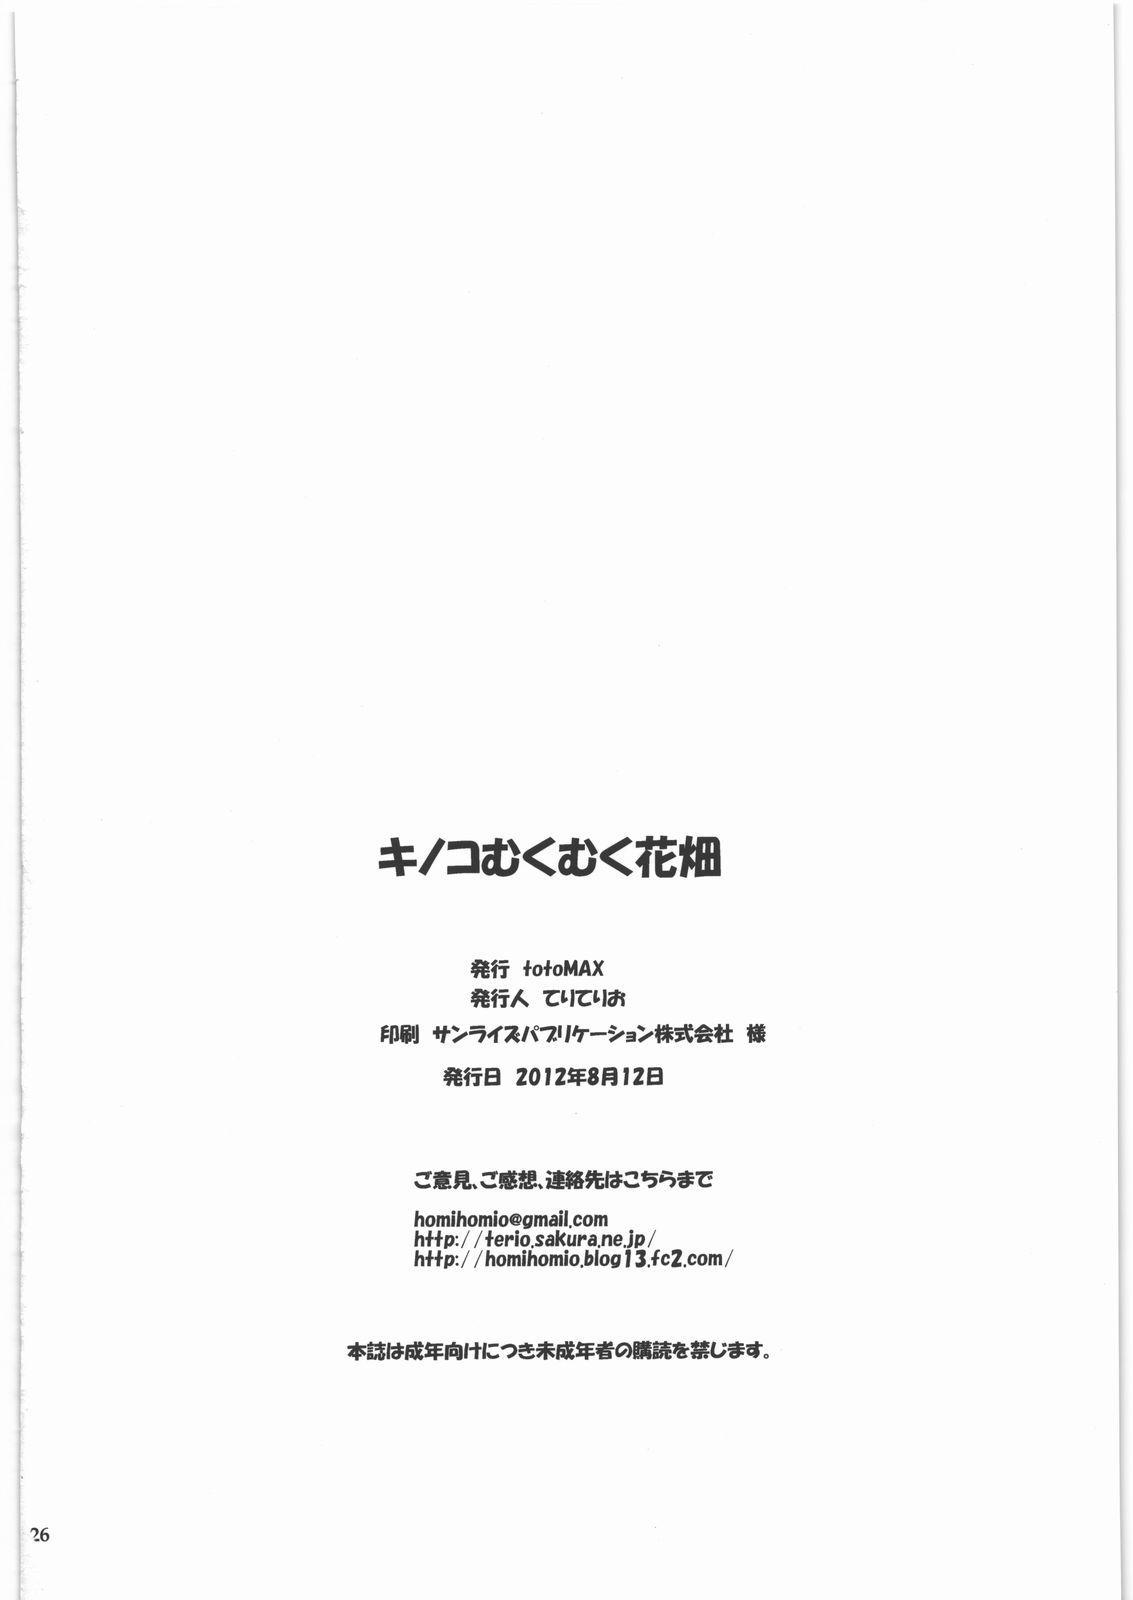 Kinoko Mukumuku Hanabatake 24